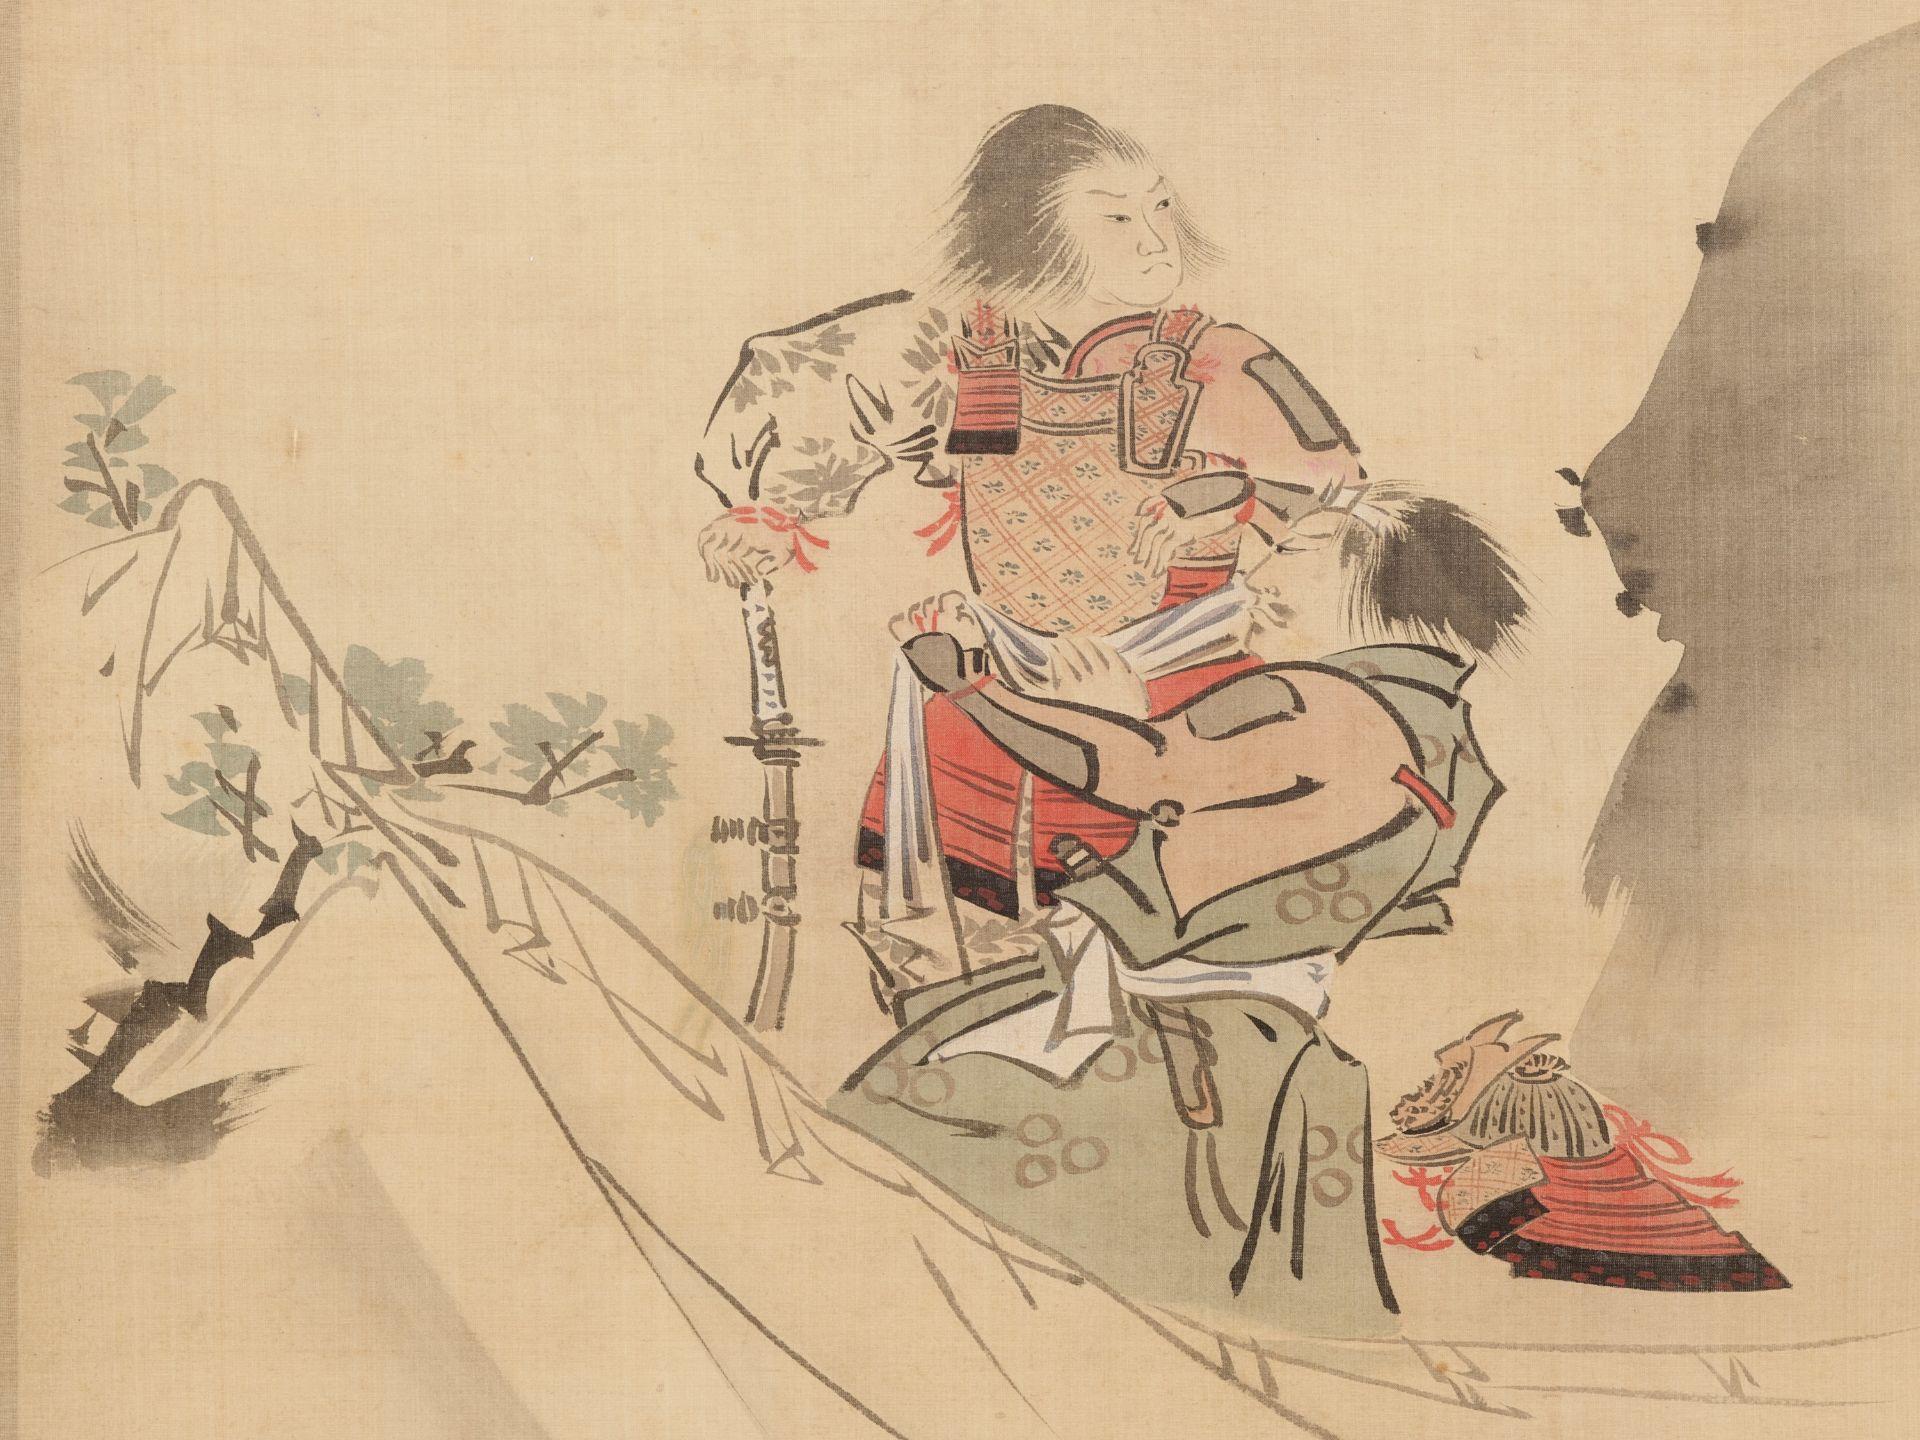 KIKUCHI YOSAI: A SCROLL PAINTING OF TWO SAMURAI IN THE MOUNTAINS - Image 2 of 5